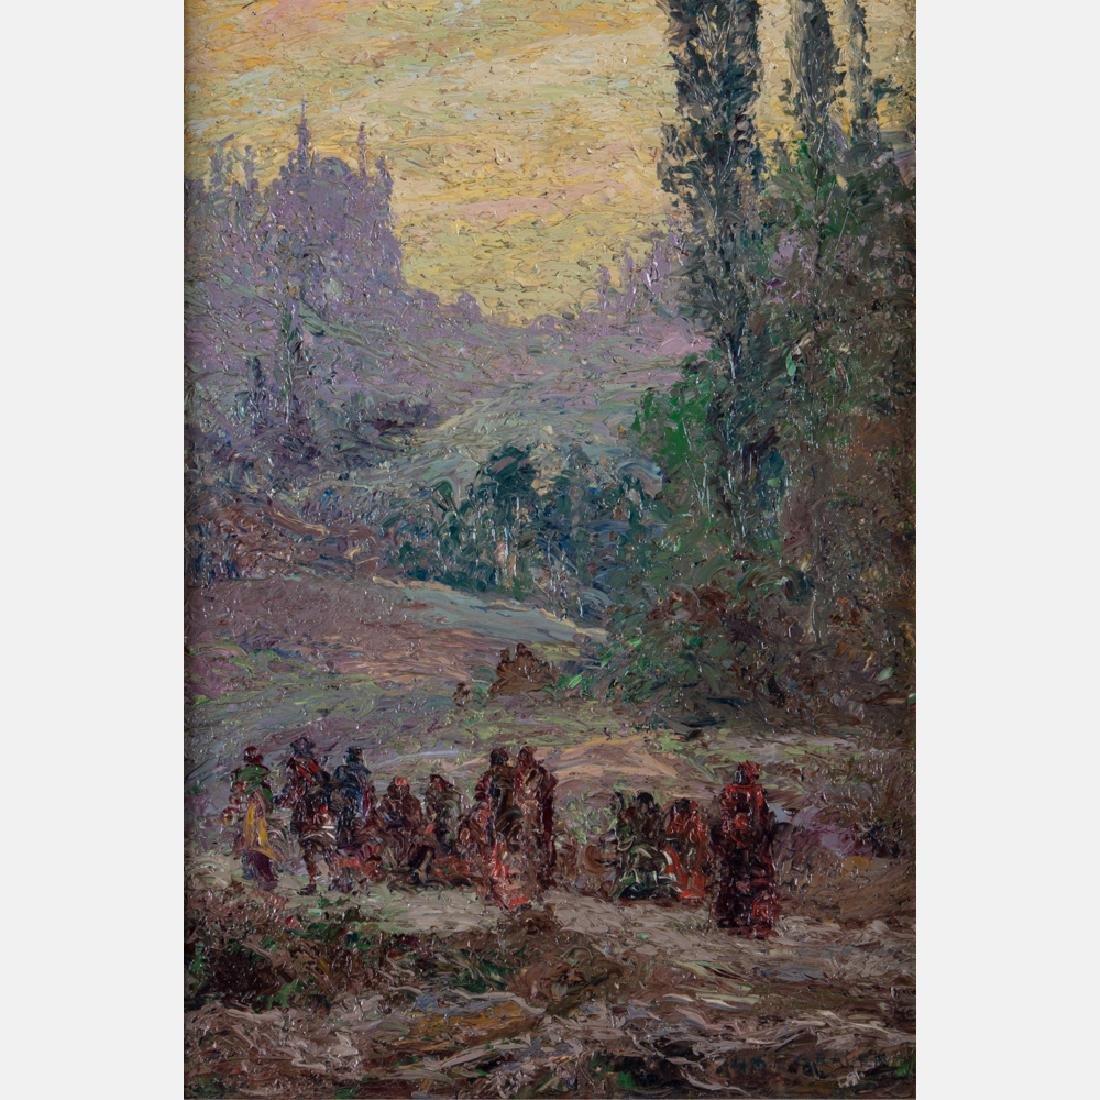 William C. Grauer (1896-1985) Figures in a Landscape,